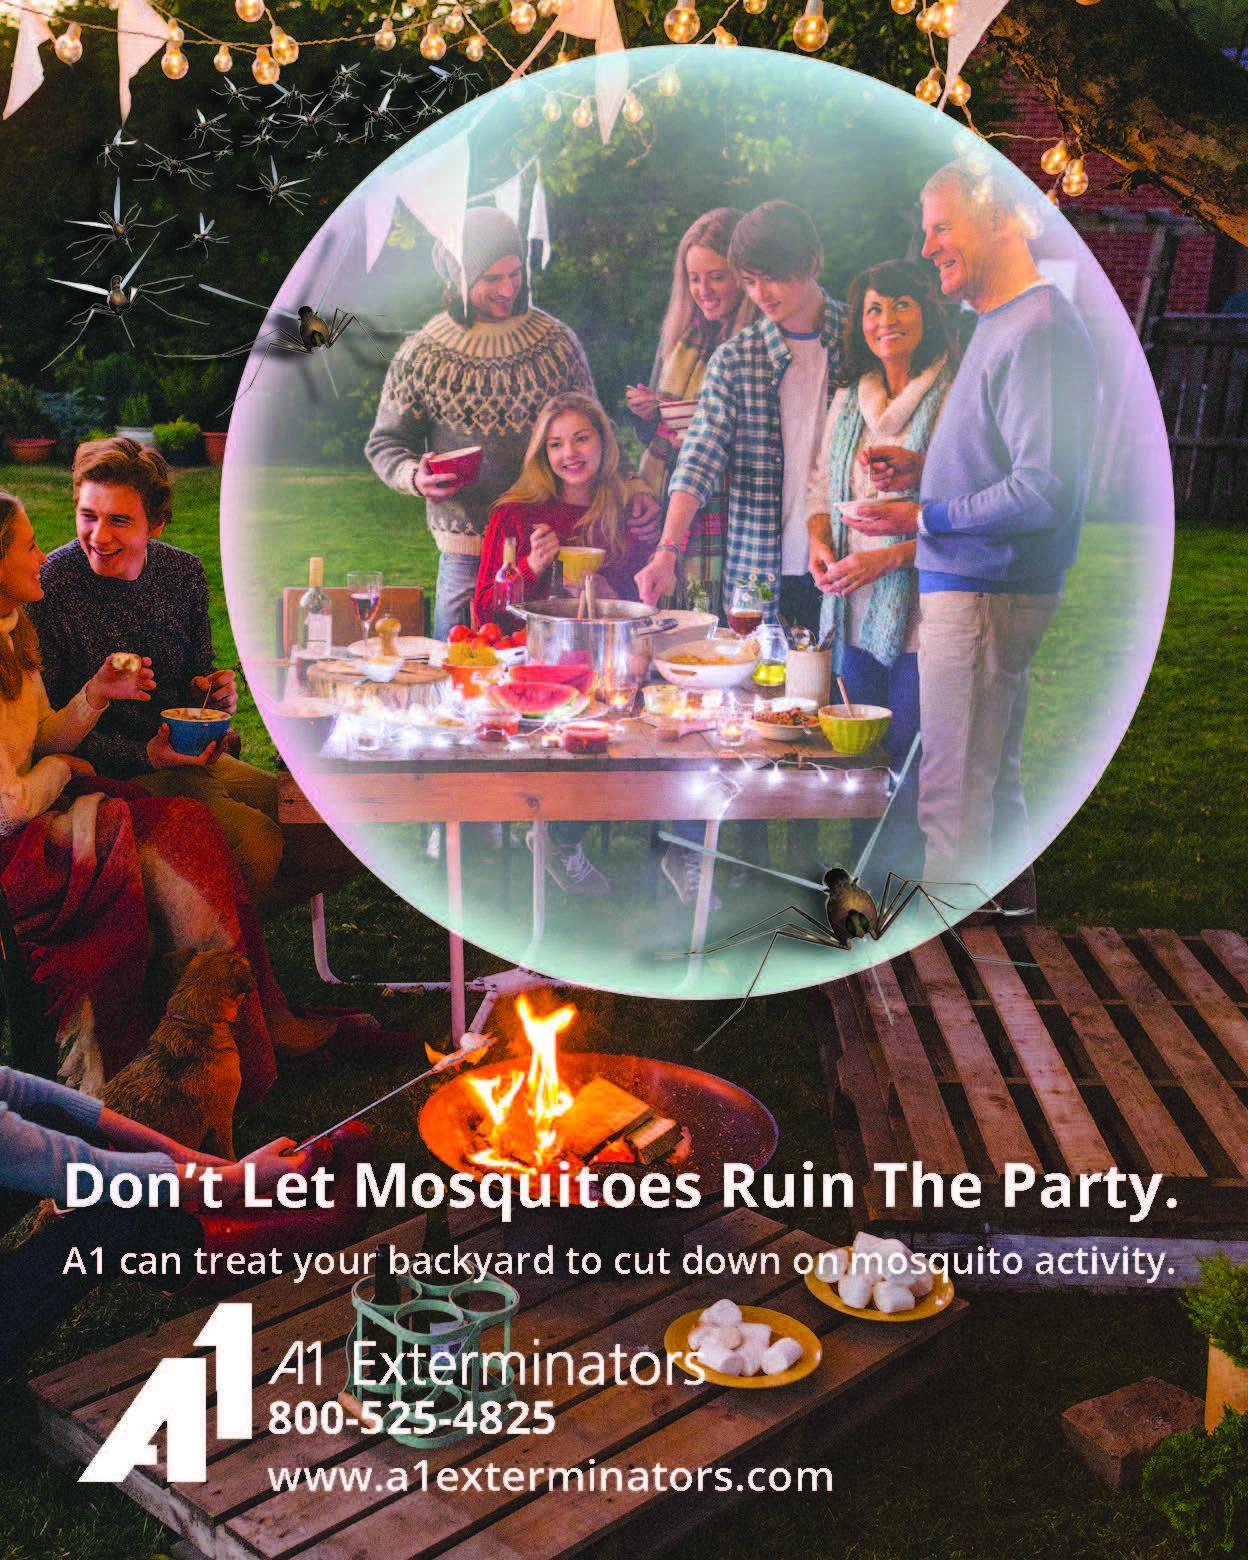 A1 Exterminators Pest Control Ants Termites Bed Bugs